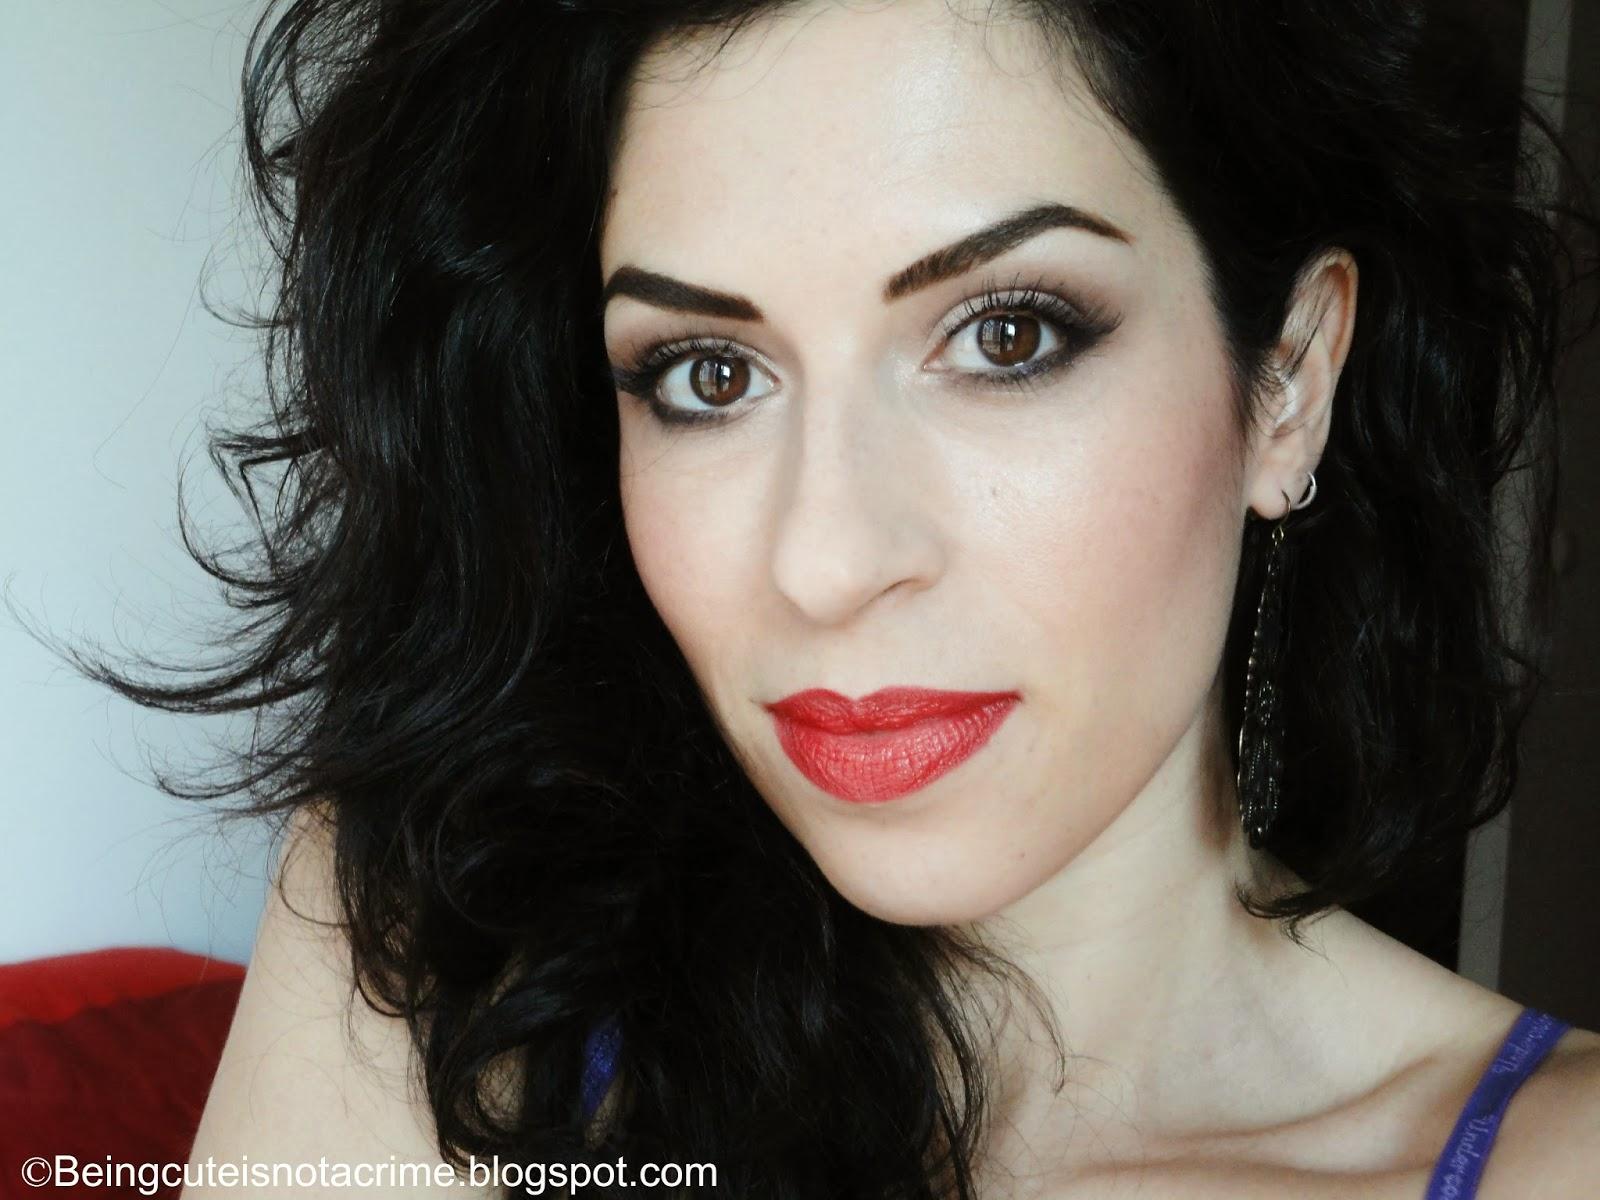 http://beingcuteisnotacrime.blogspot.nl/2014/02/orange-lips-lisa-eldridge-inspiration.html